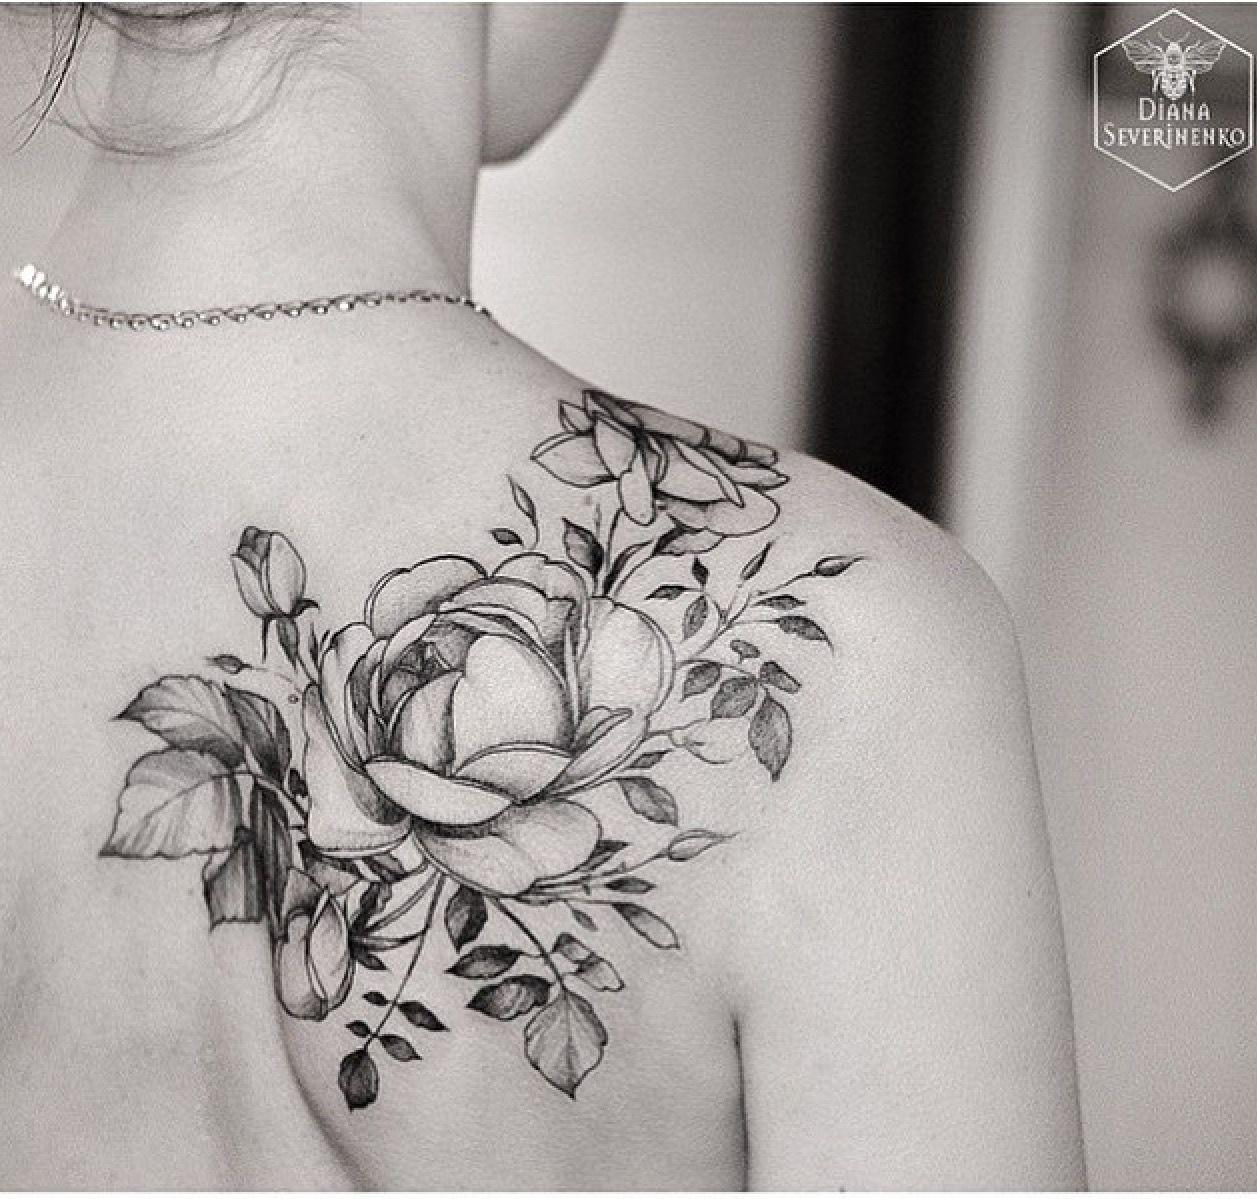 Pinterest Ladsmb Cool Shoulder Tattoos Shoulder Tattoos For Women White Rose Tattoos